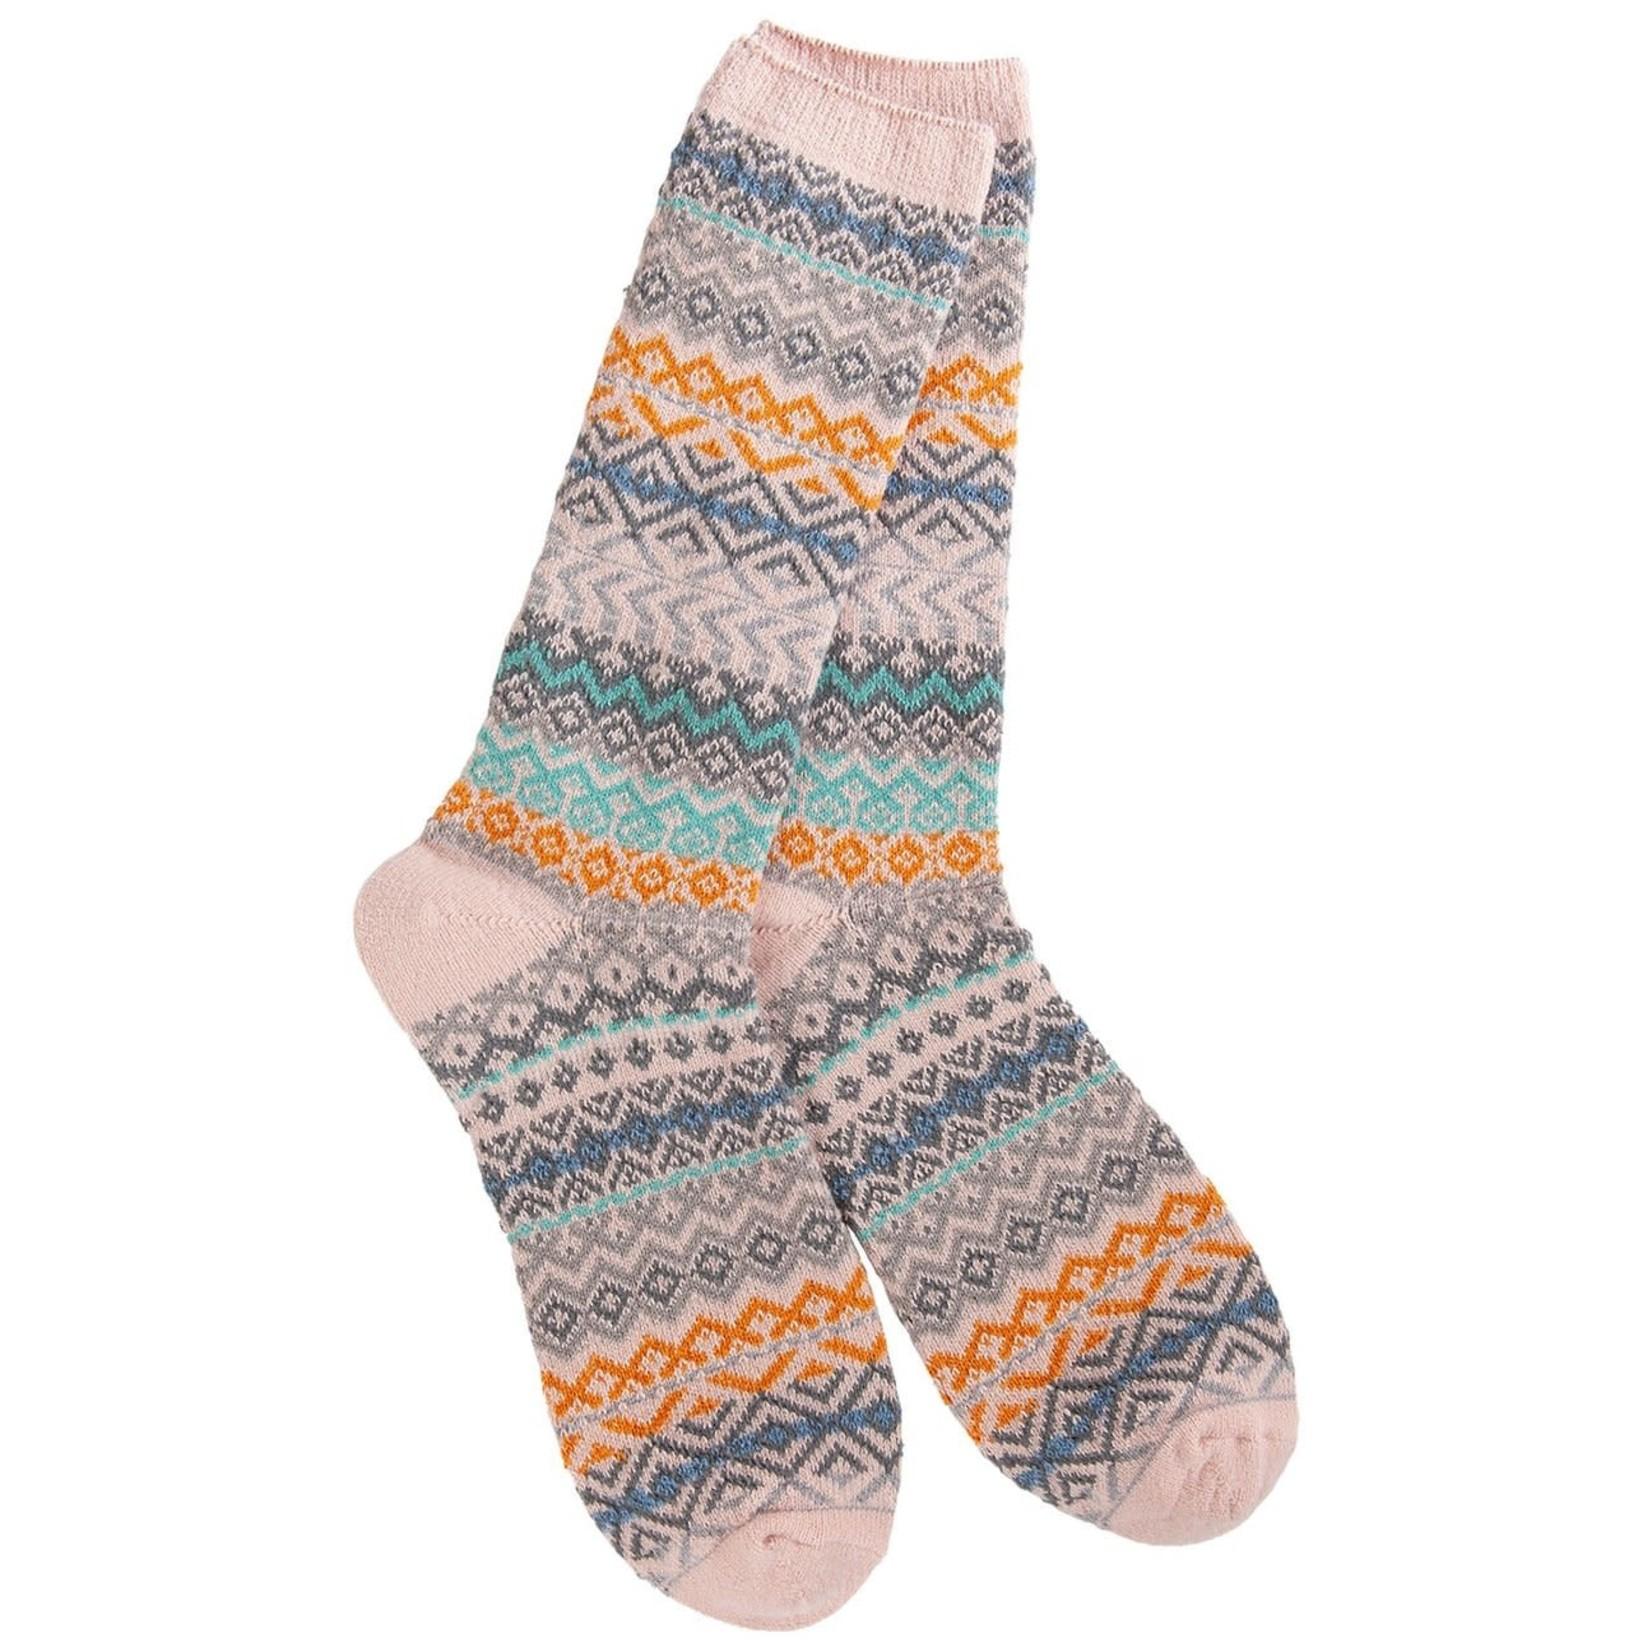 World's Softest Weekend Studio Crew Socks - Phoenix Sand